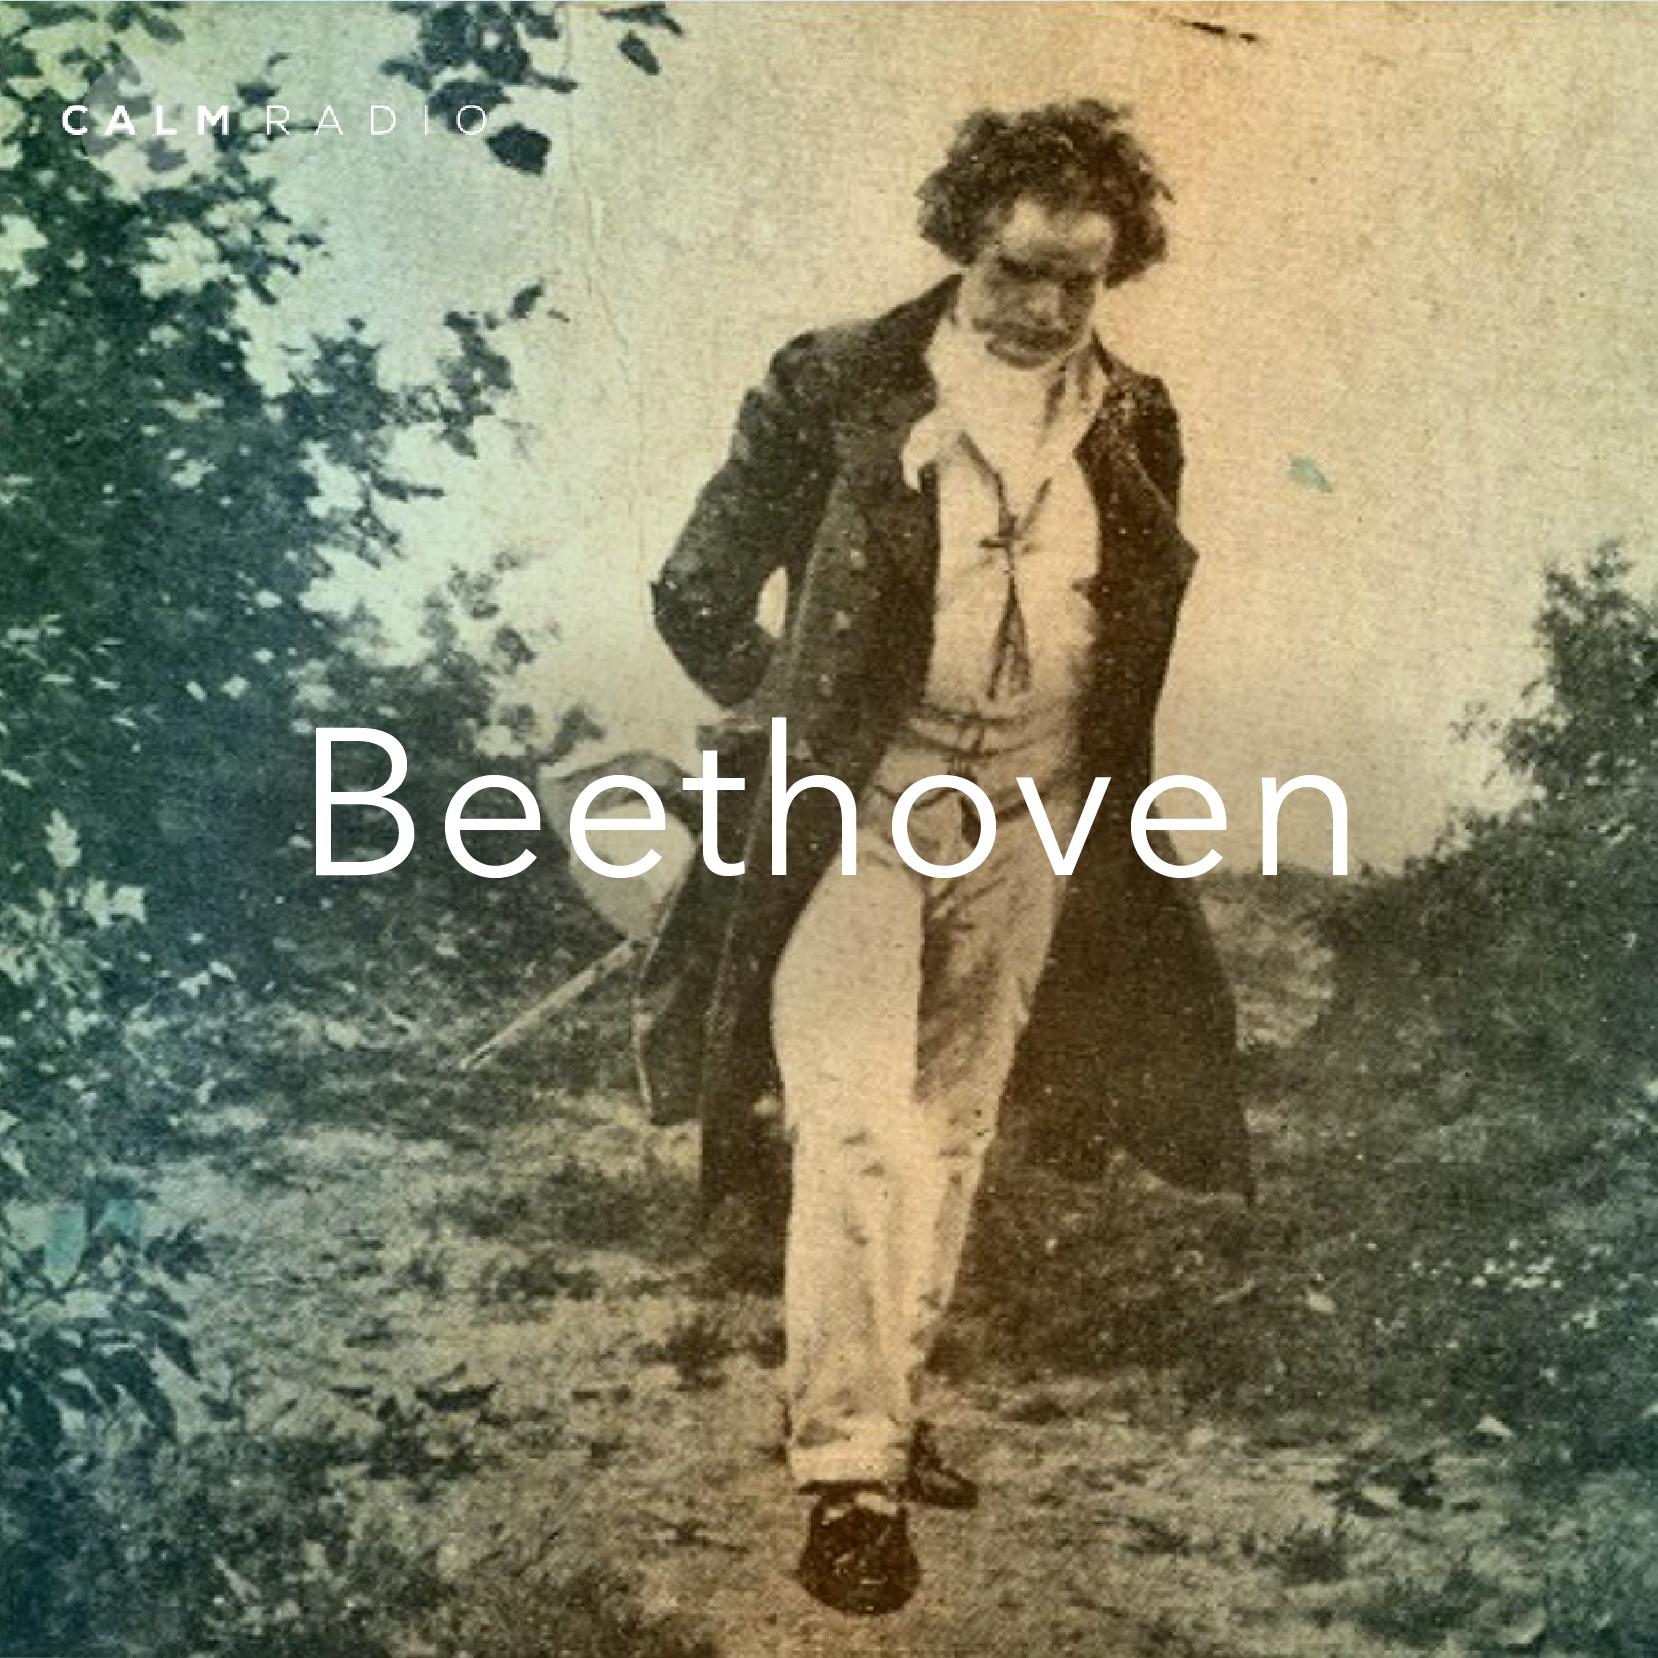 CALMRADIO.COM - Beethoven